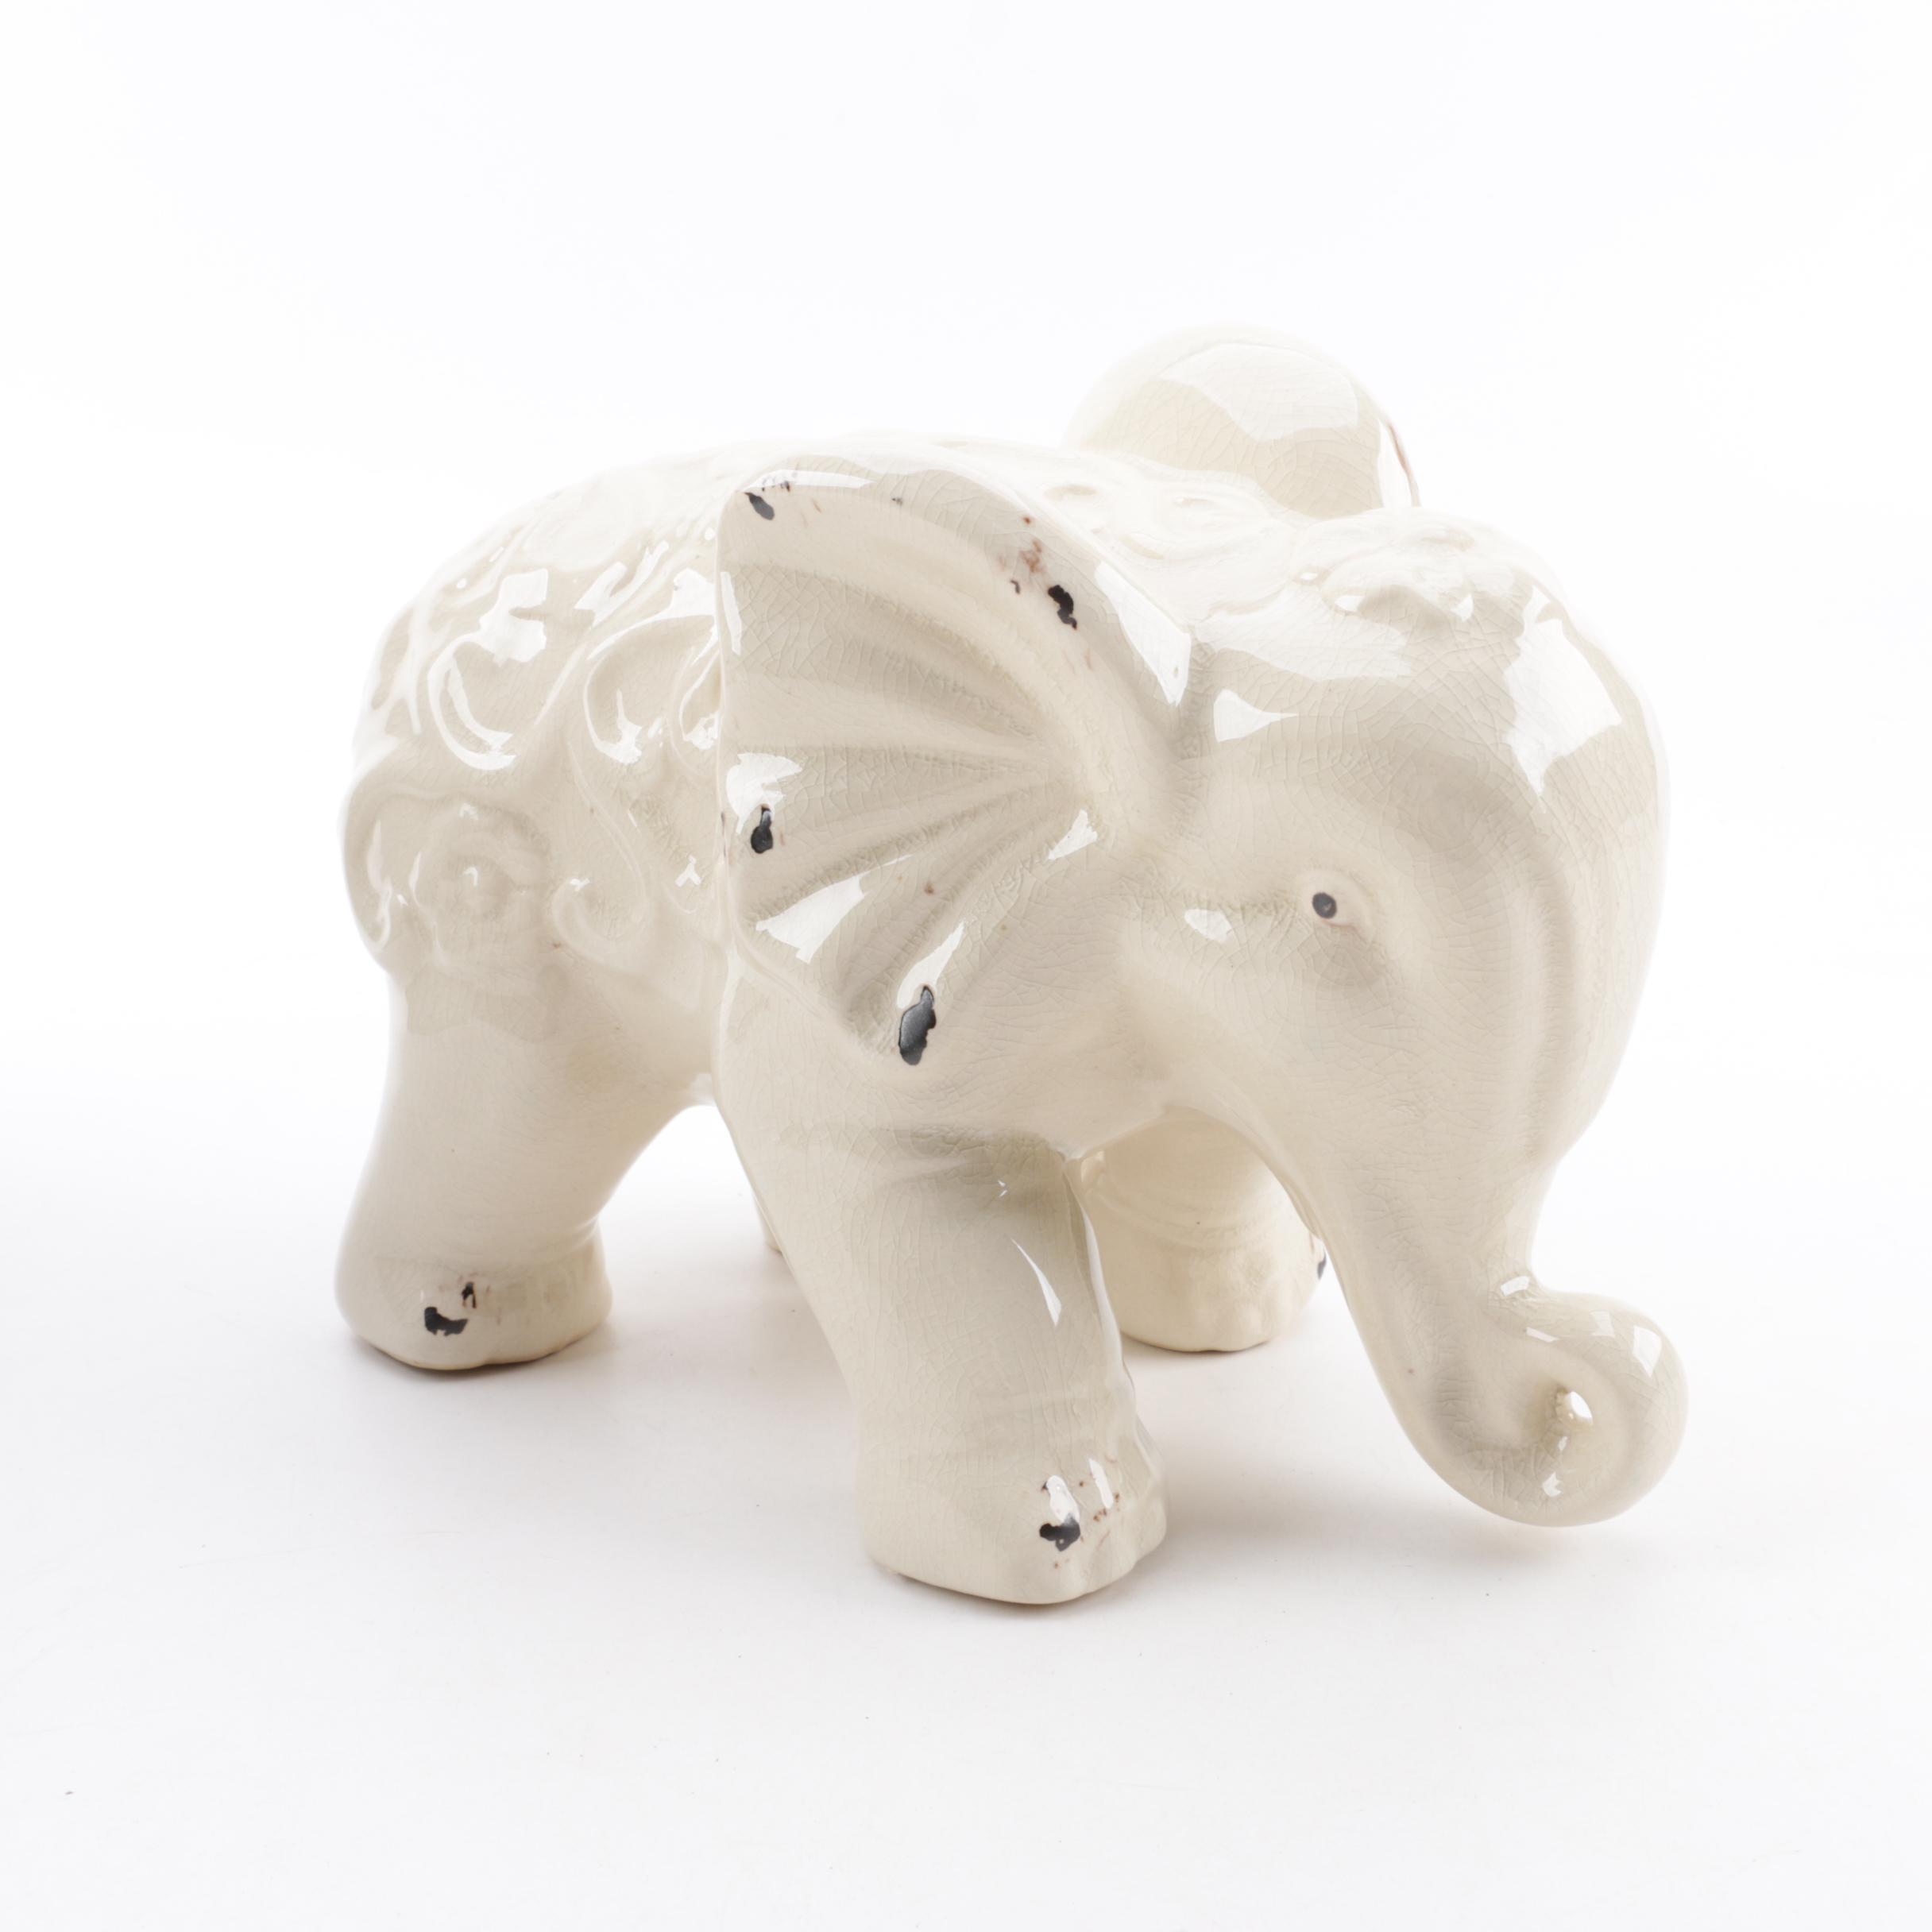 Glazed Ceramic Elephant Figure